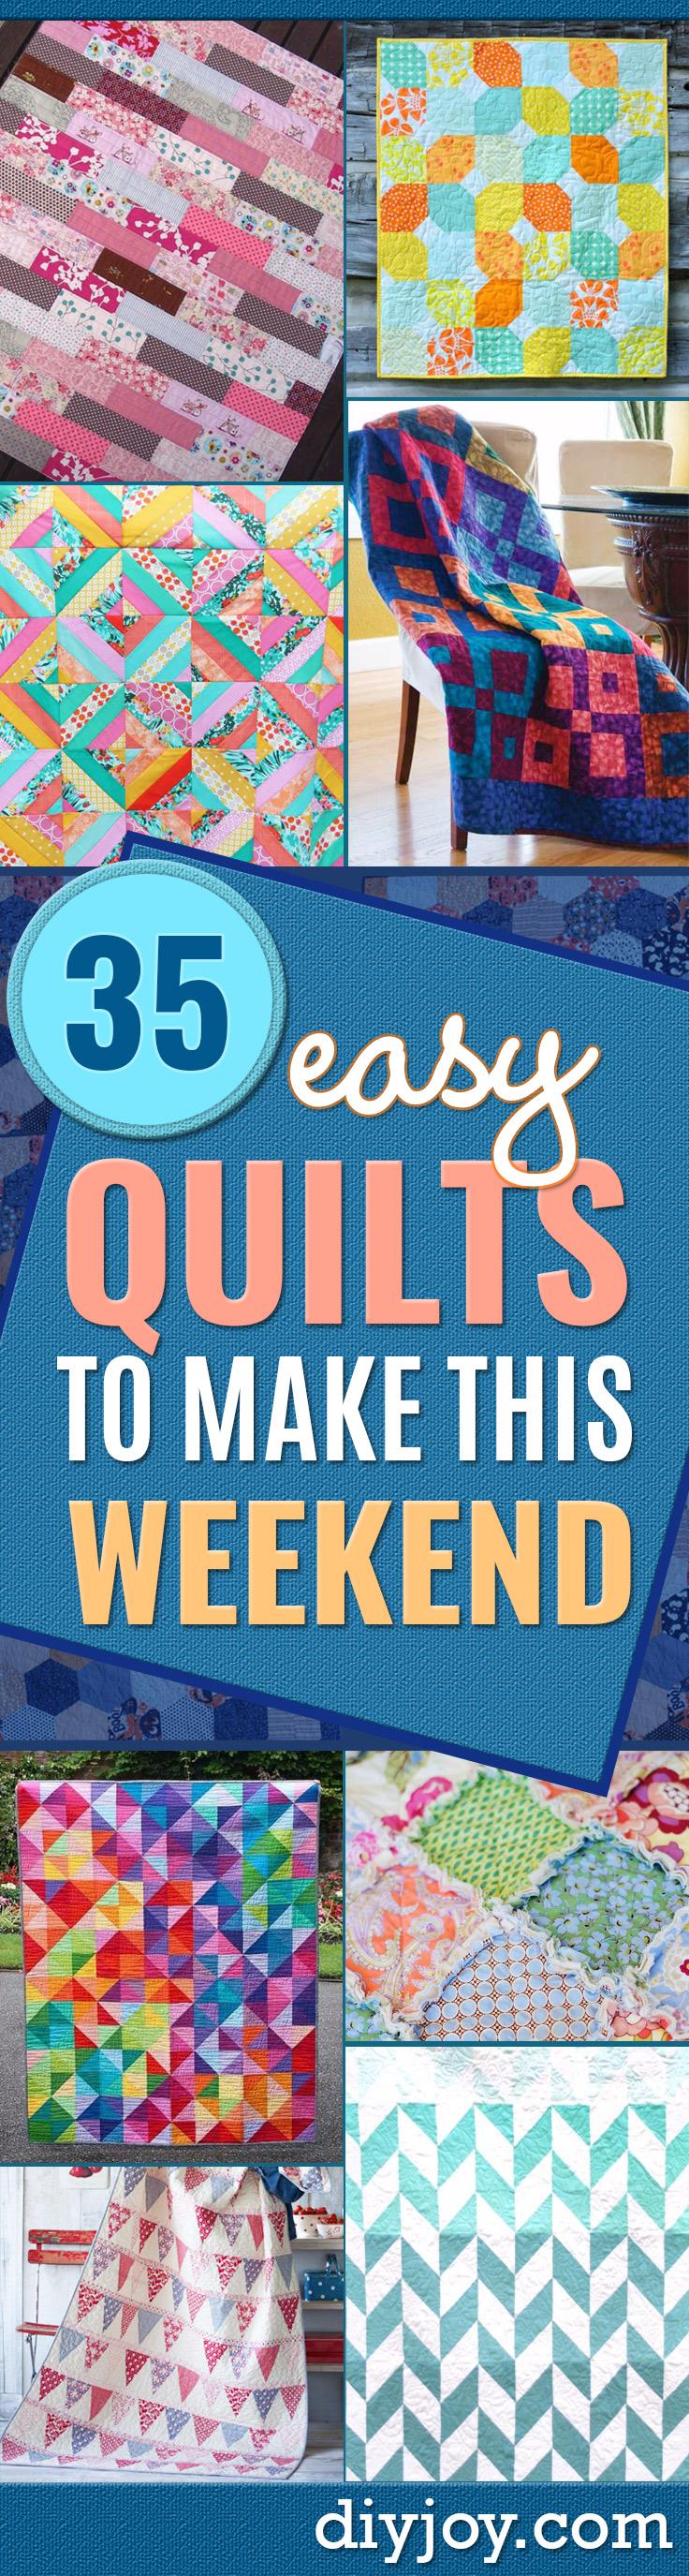 35 Easy Quilts To Make This Weekend - DIY Joy : weekend quilt - Adamdwight.com